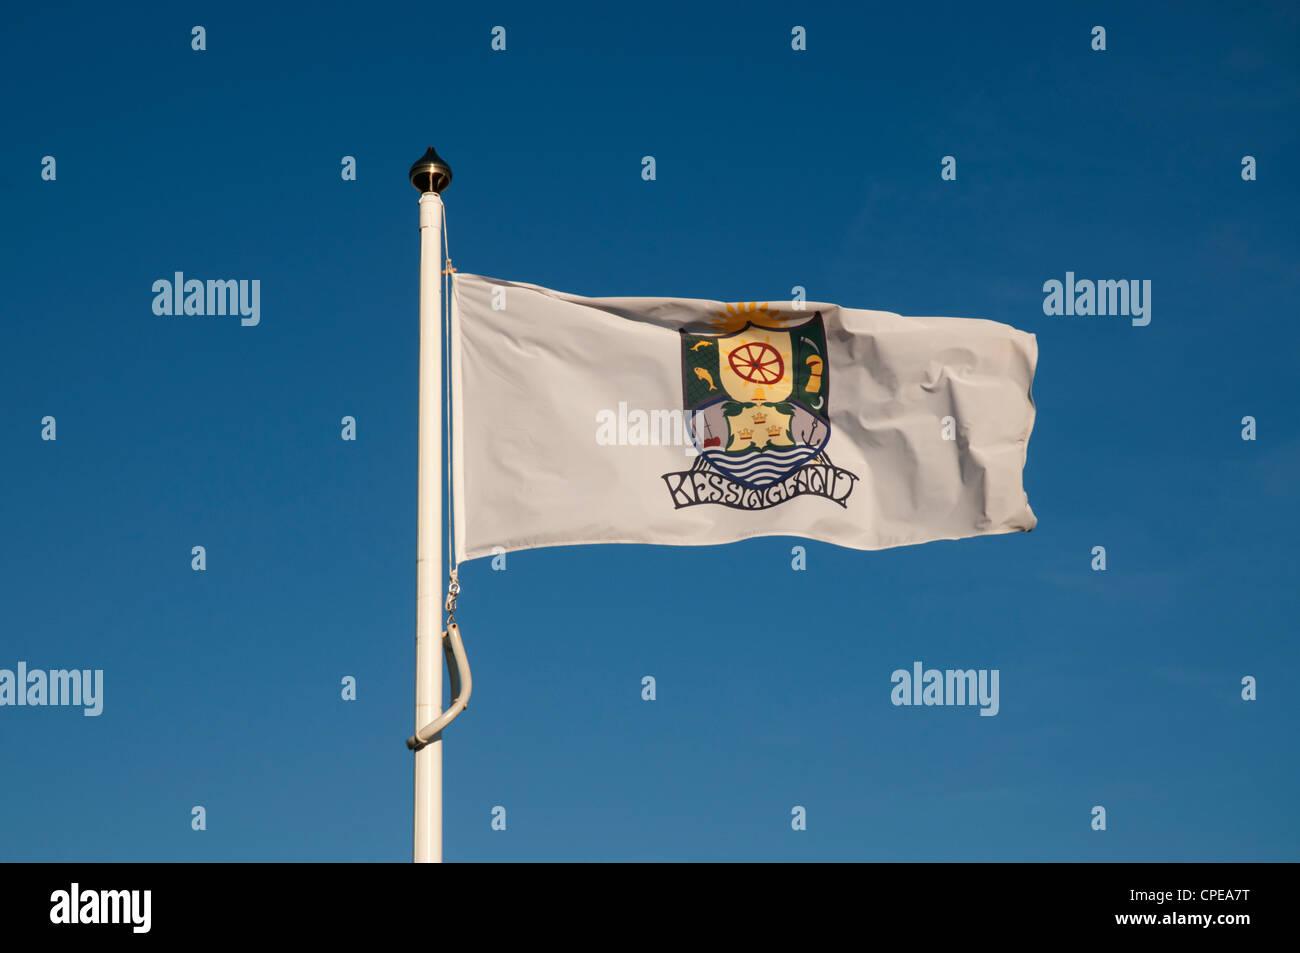 Flag for Kessingland Village, Kessingland, Suffolk, England - Stock Image